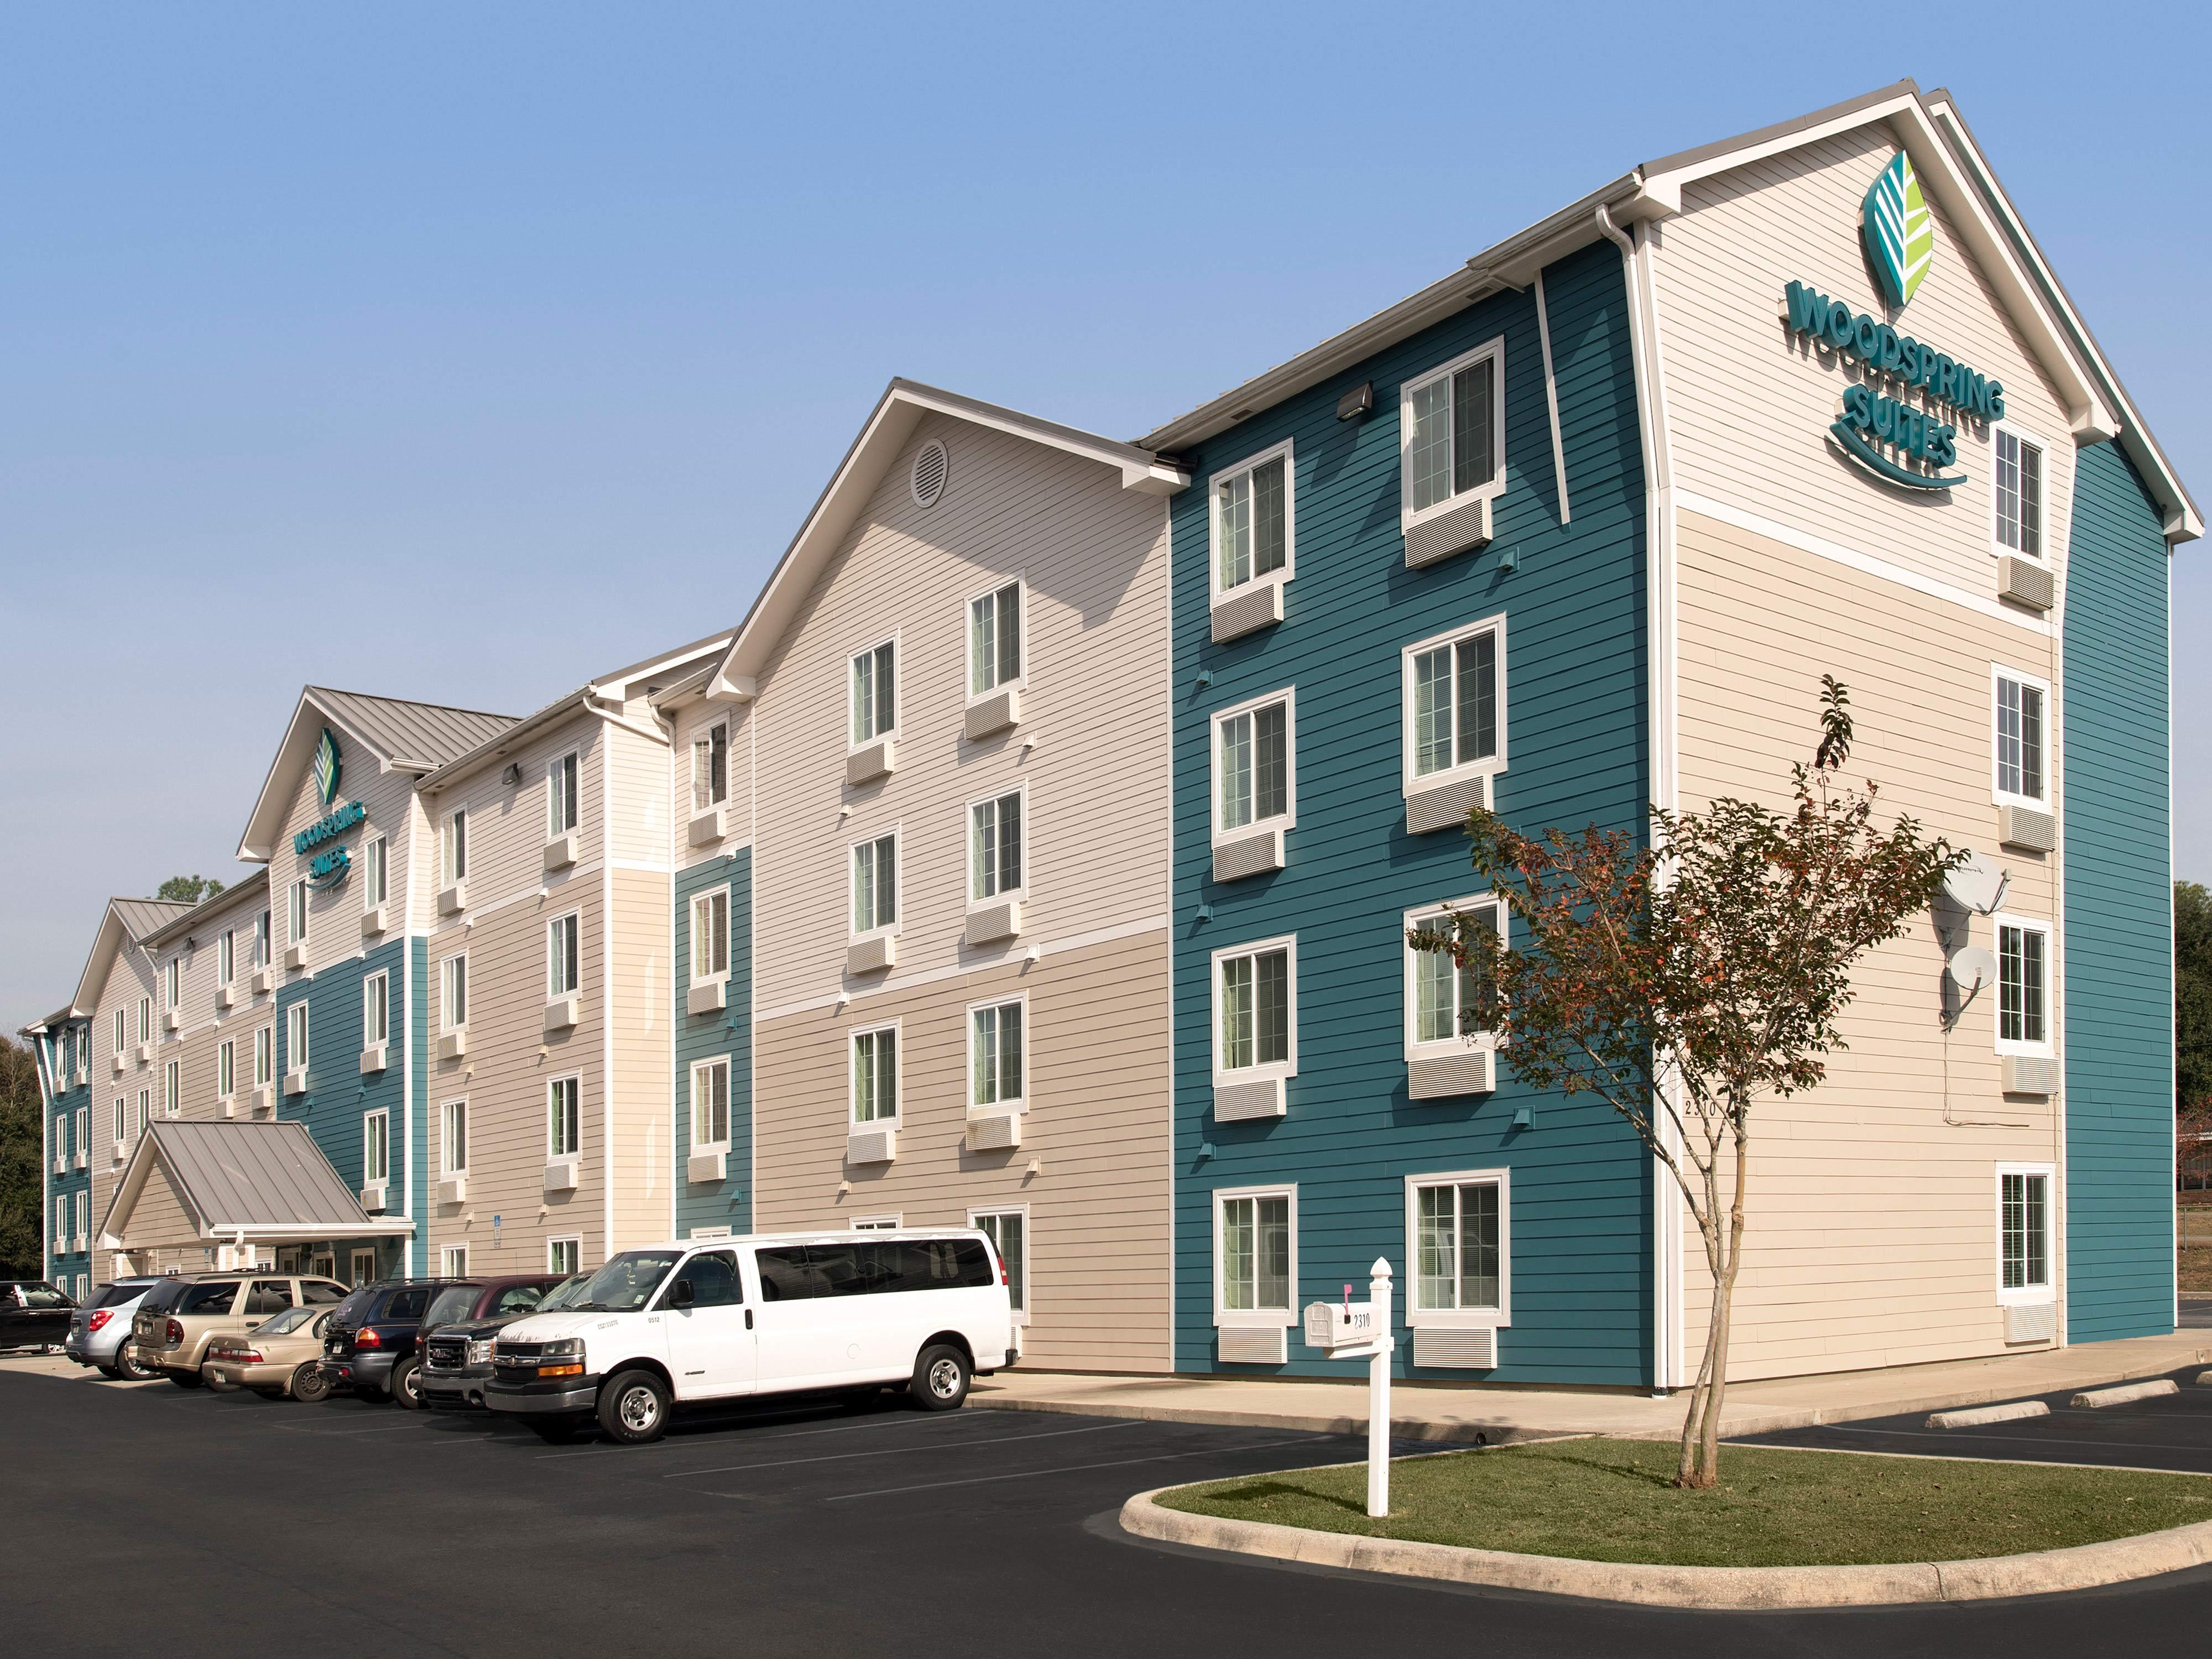 WoodSpring Suites Pensacola Northeast image 31